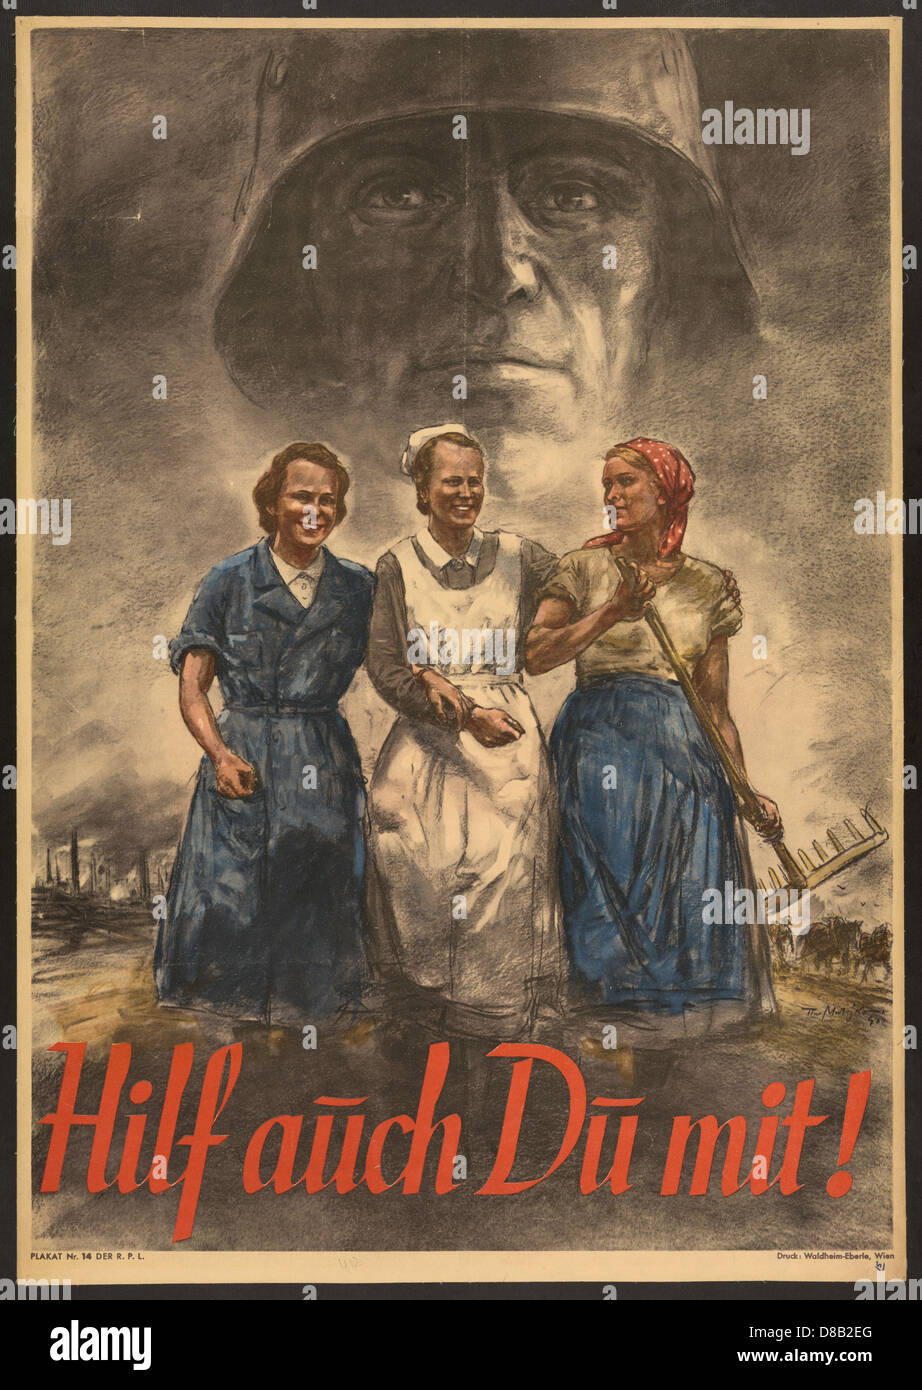 Nazi Propaganda Women Stock Photos & Nazi Propaganda Women ... Nazi Women Propaganda